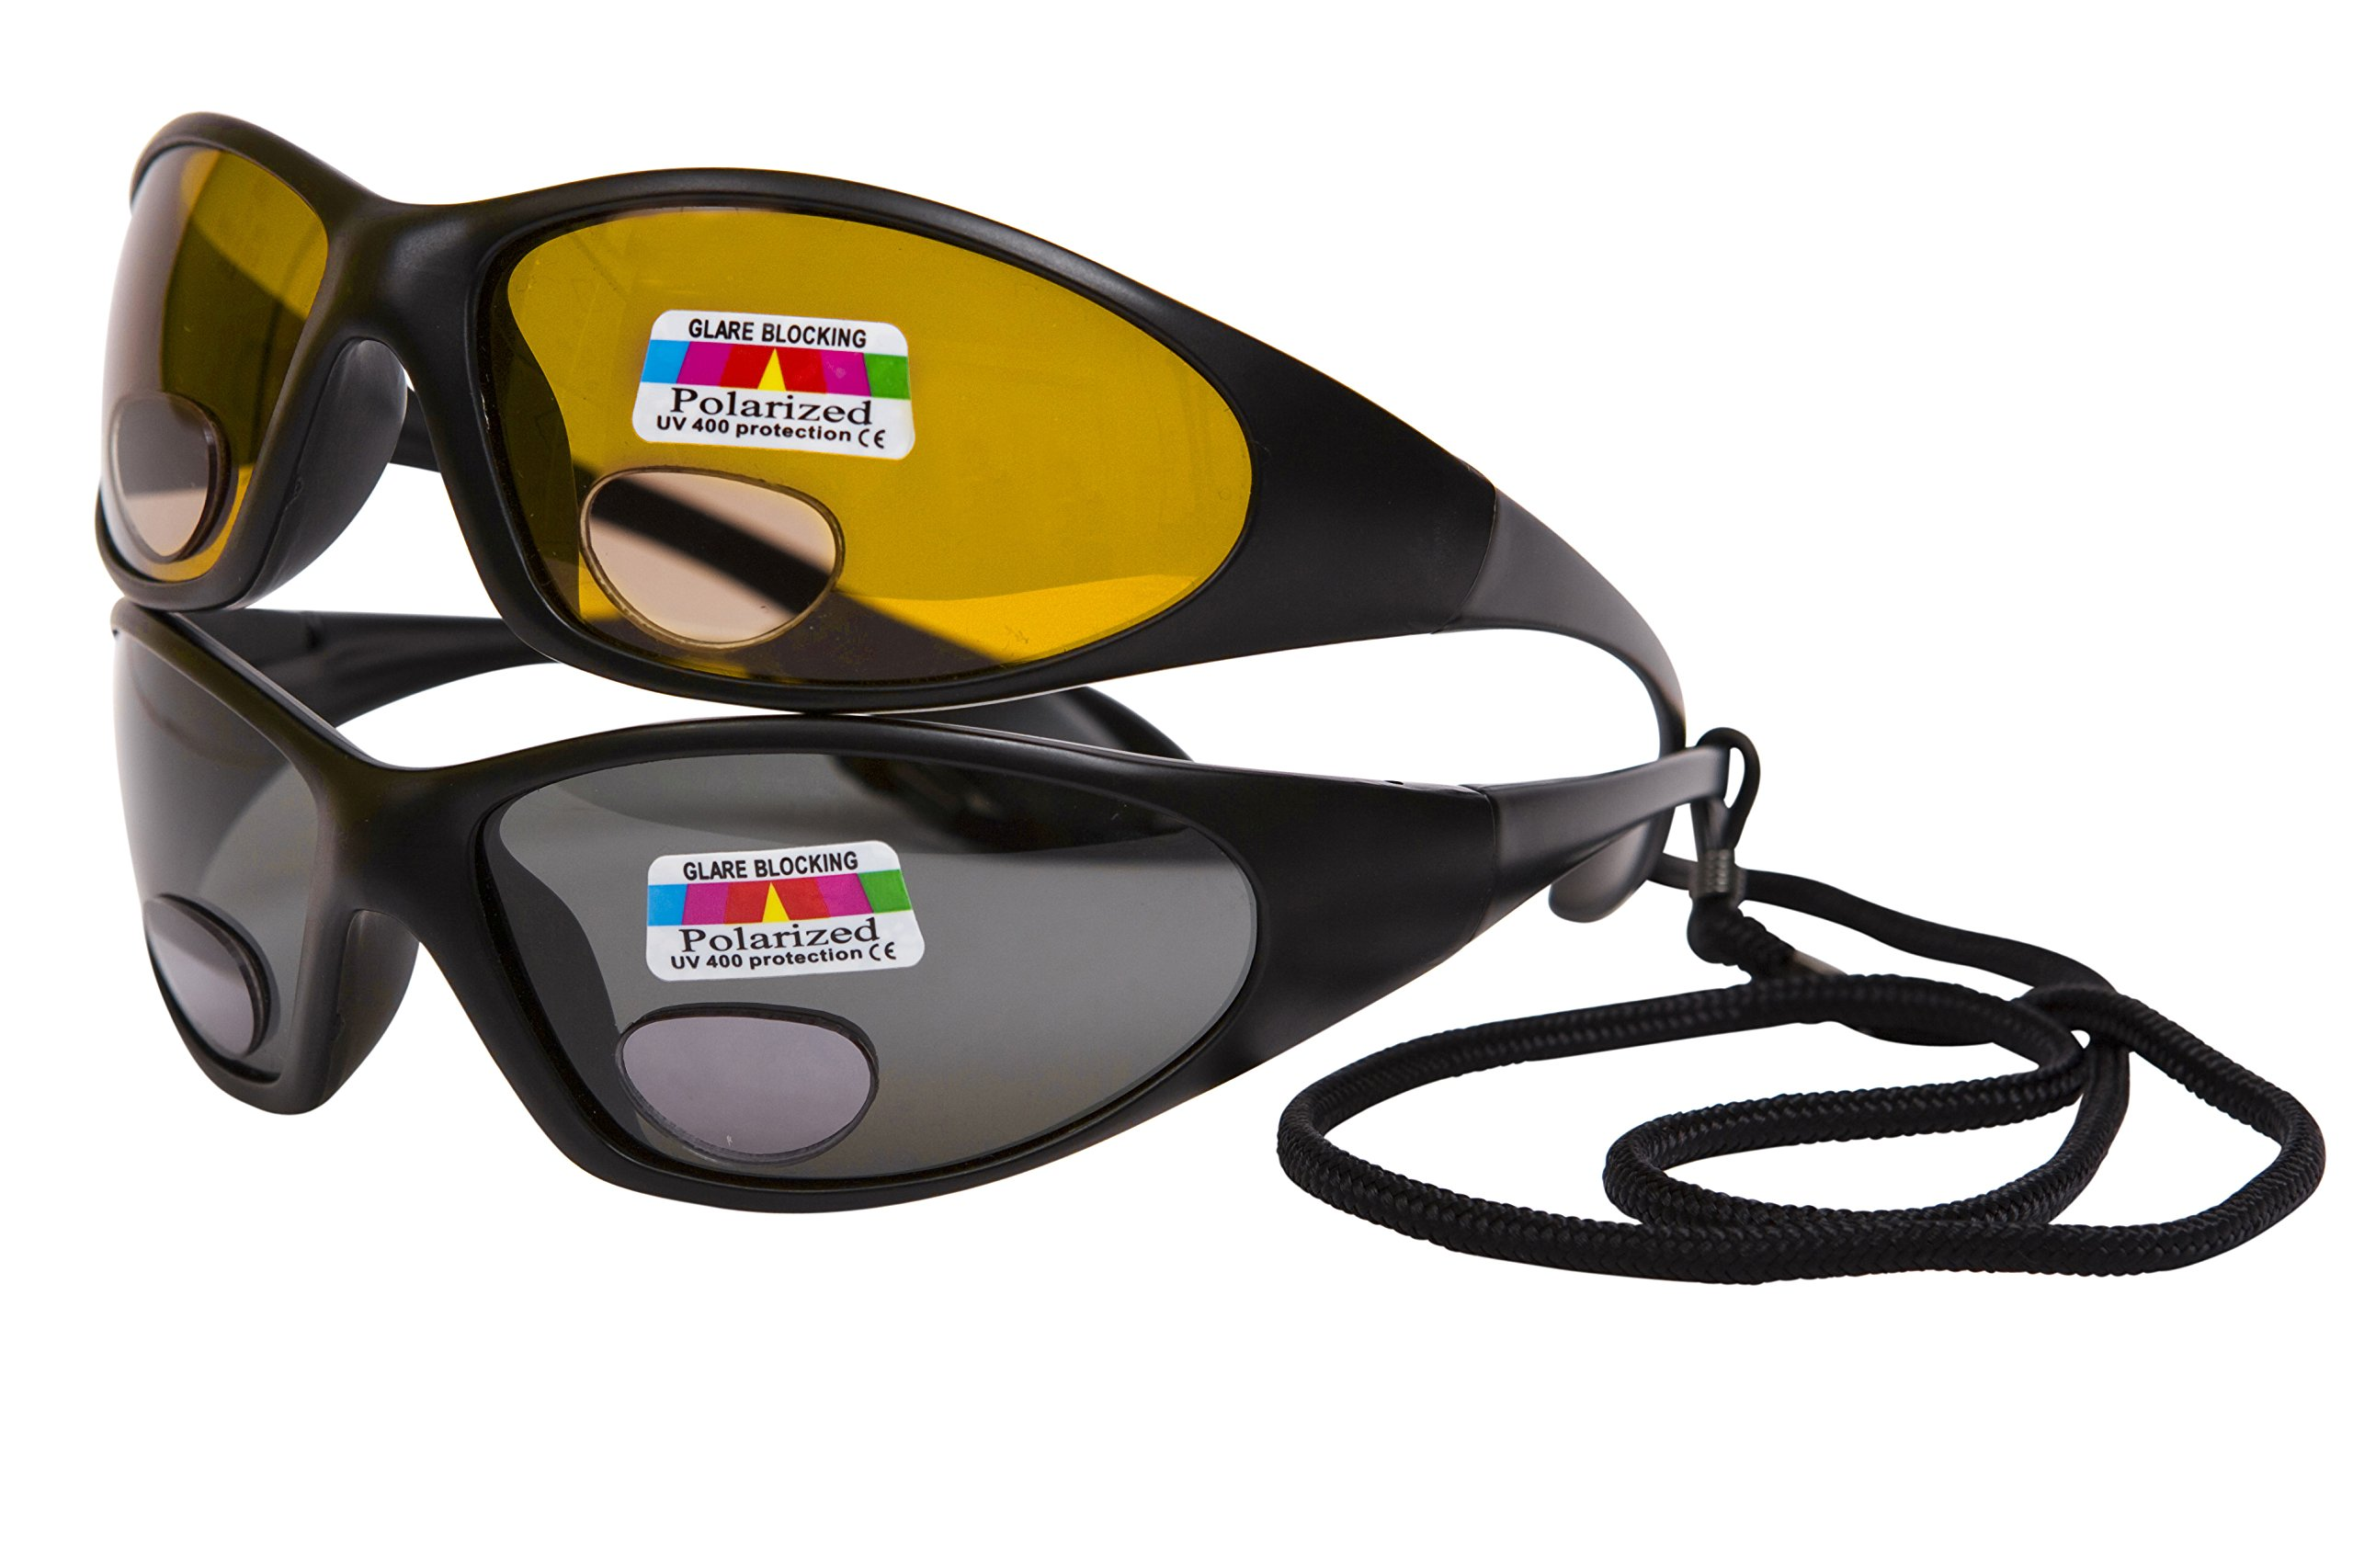 cdf6faf411c 2 pairs Polarised fishing glasses with bifocal lenses +2.50 - One pair grey  lenses for